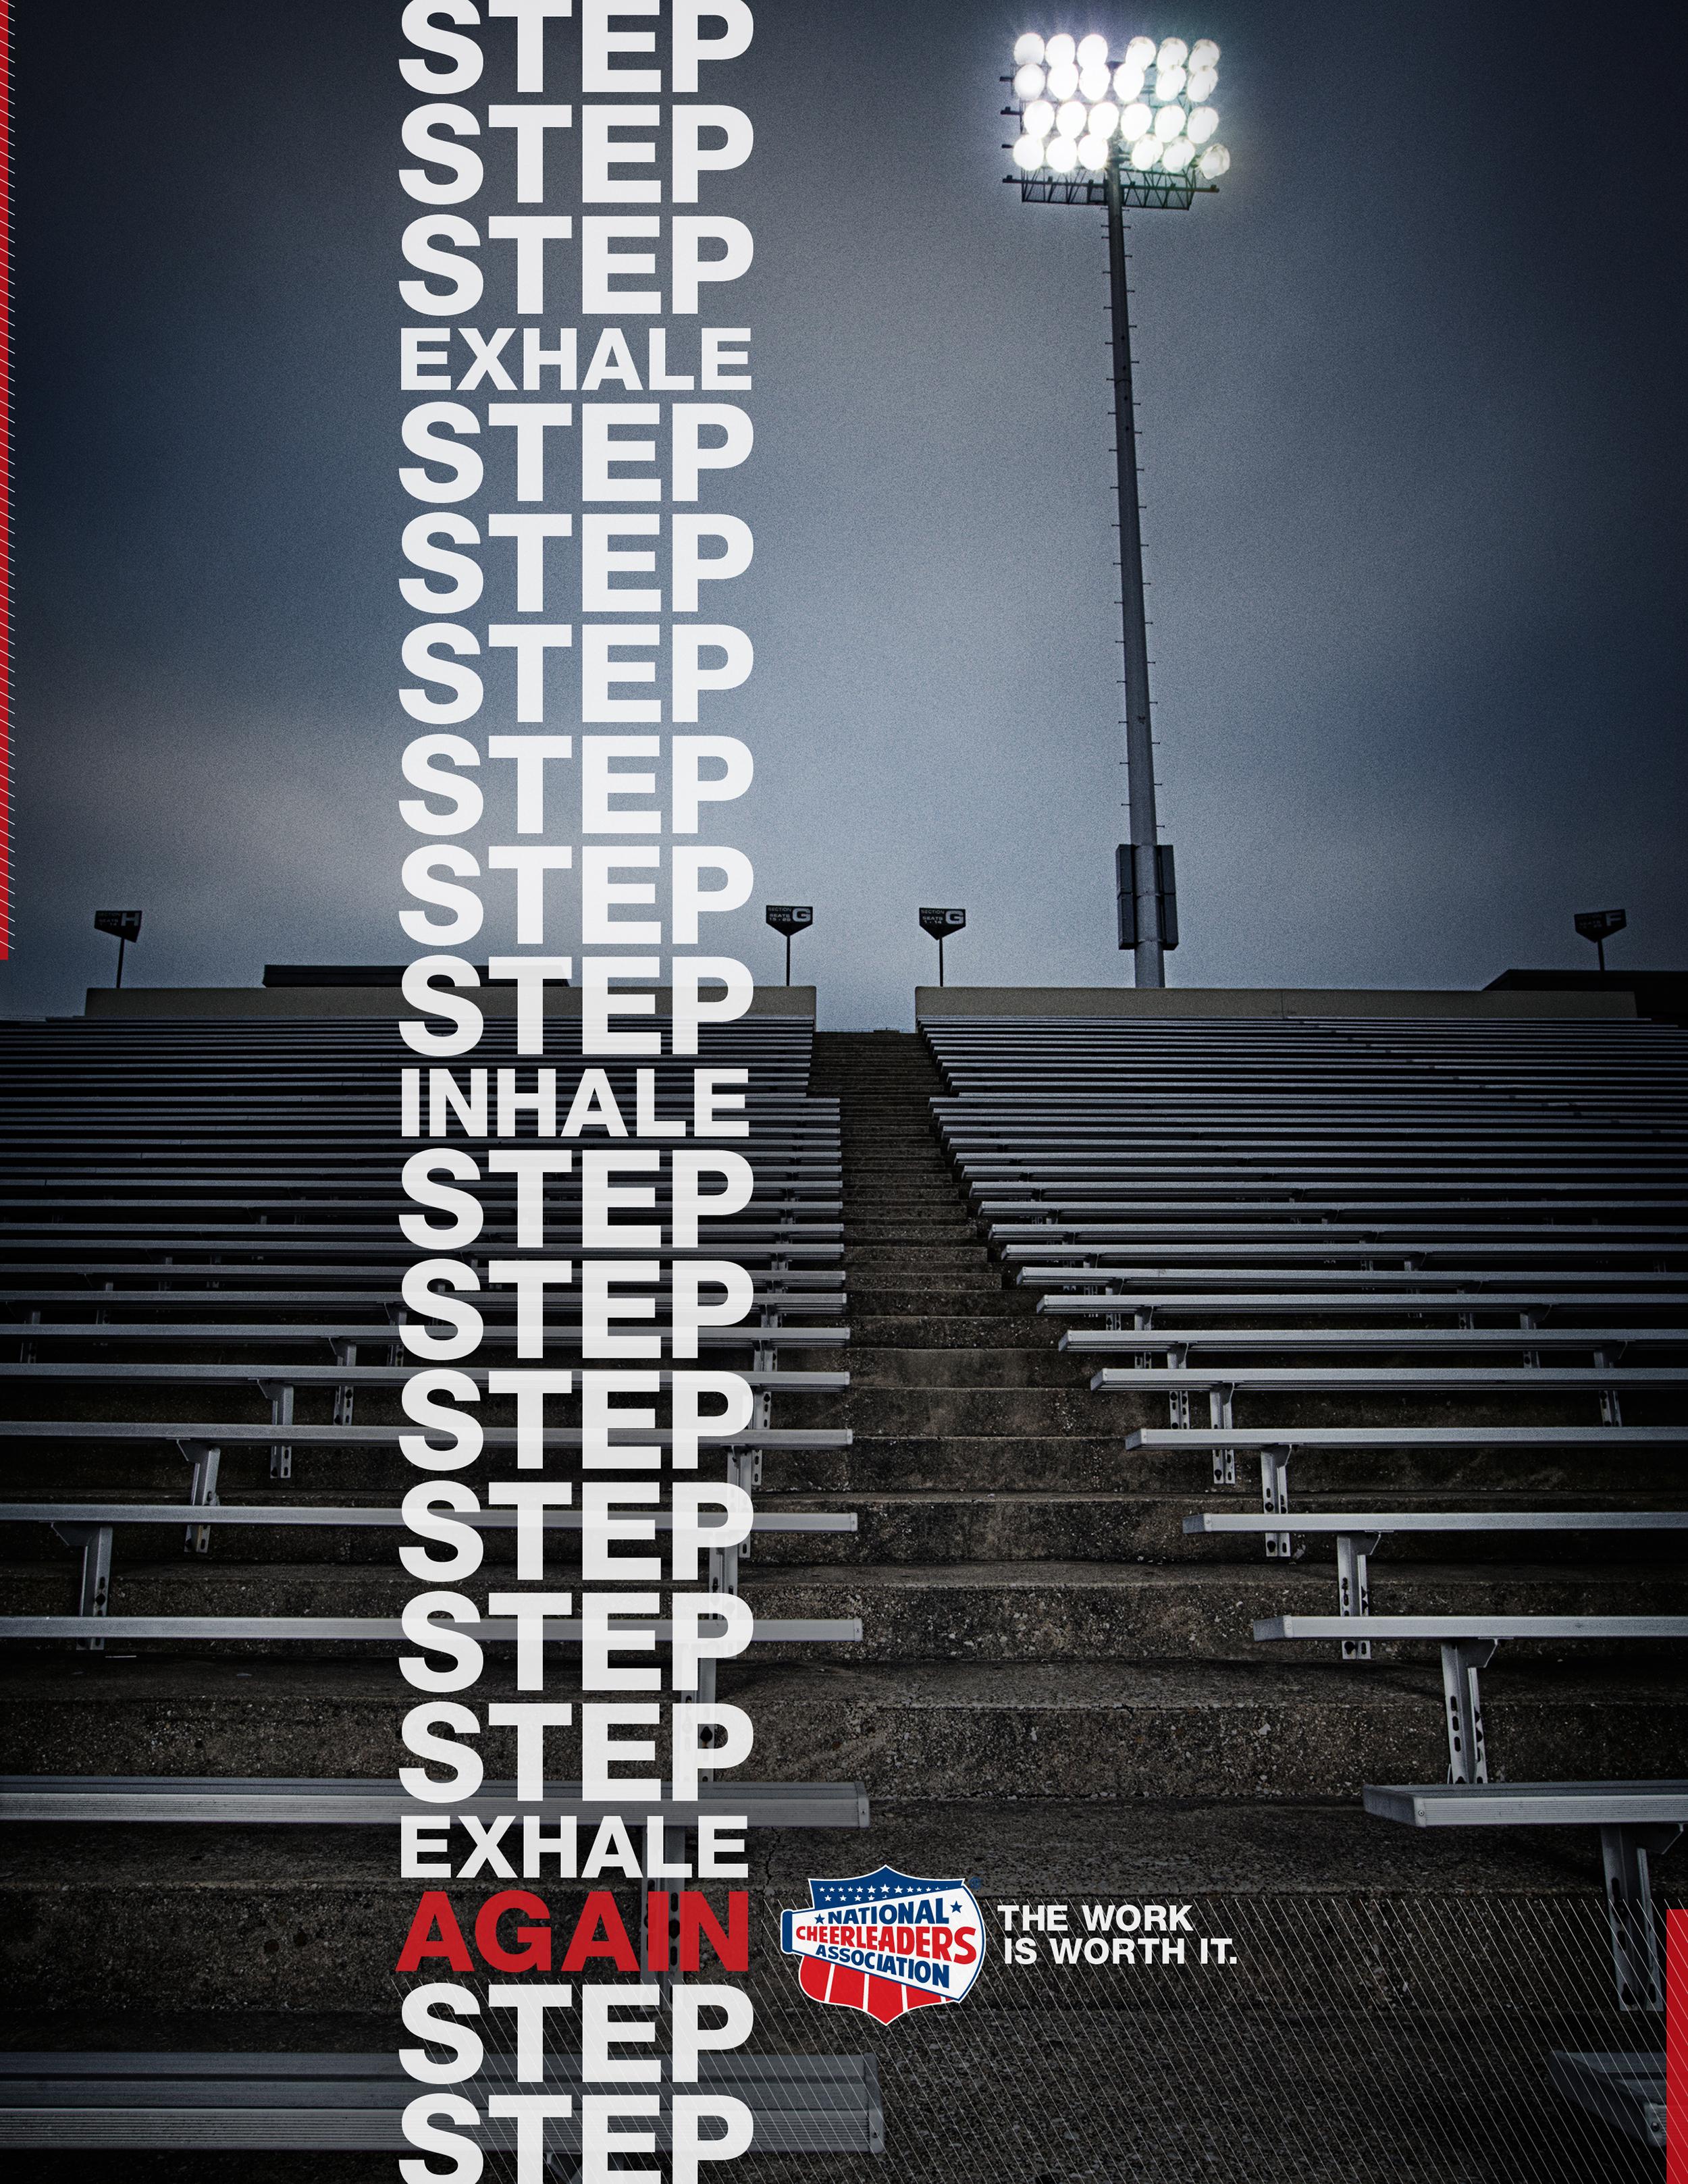 ryan-smith-creative-director-national-cheerleaders-association-steps